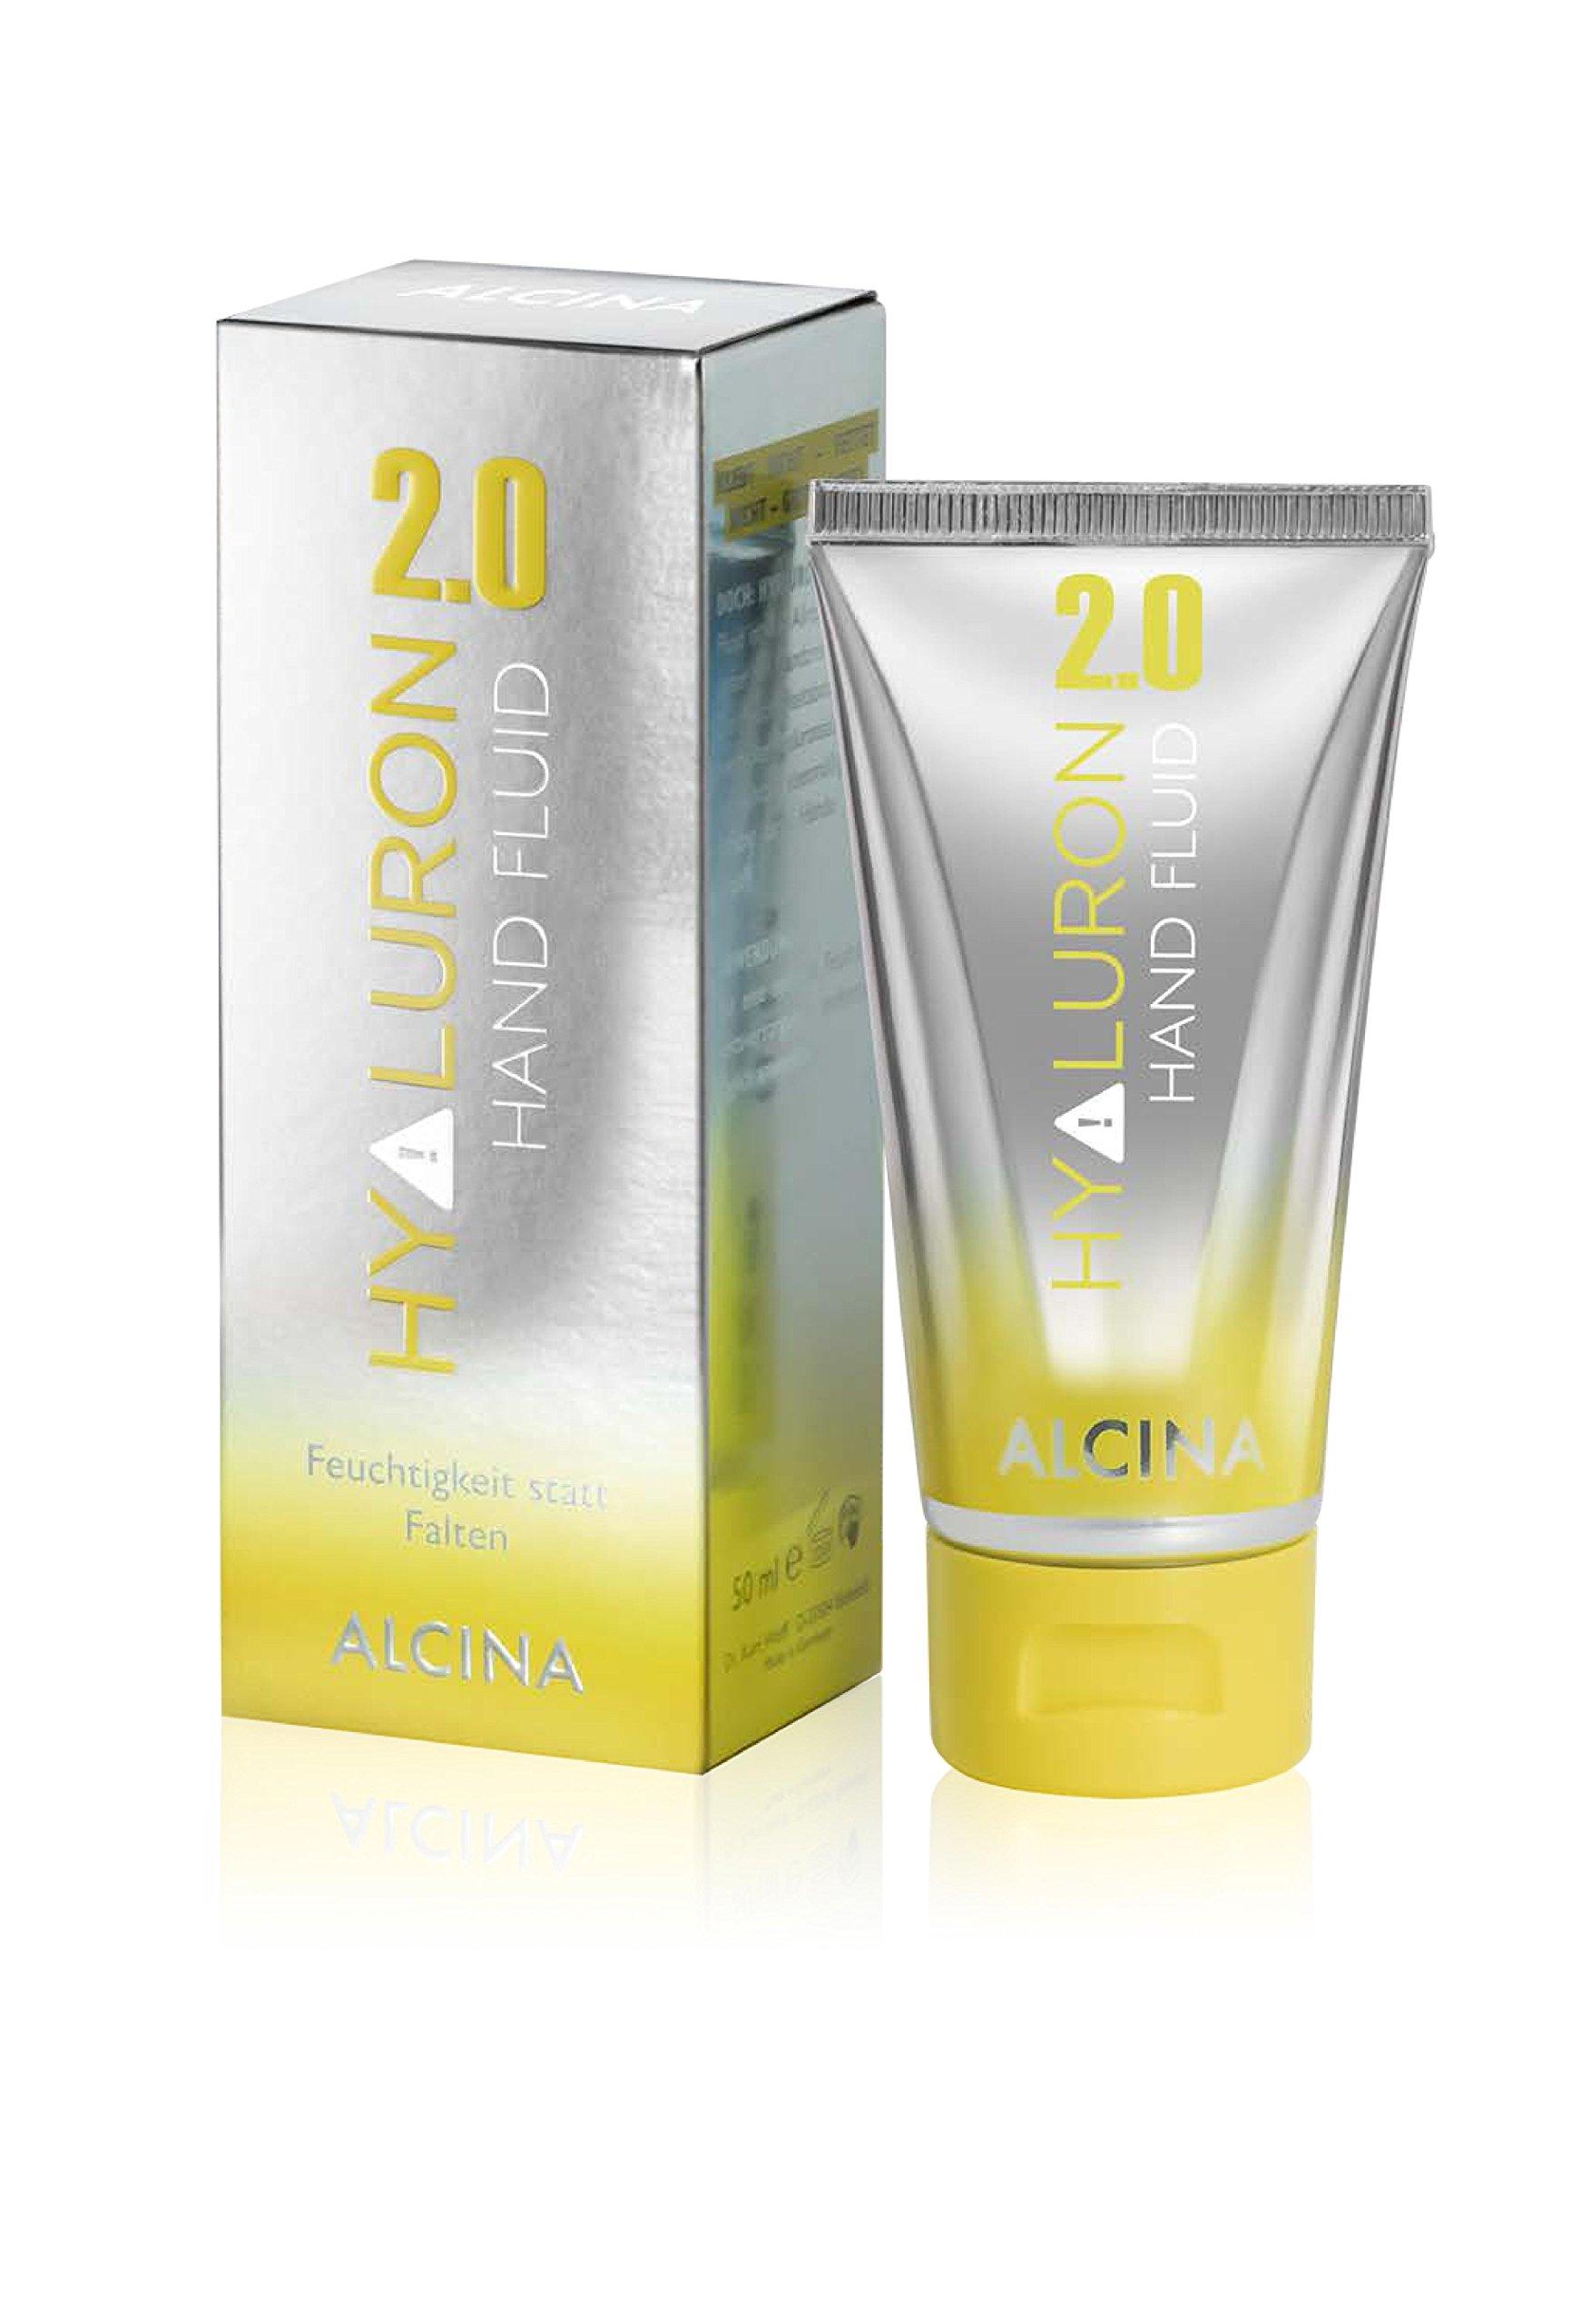 ALCINA Hyaluron 2.0 Hand-Fluid, 50 ml product image